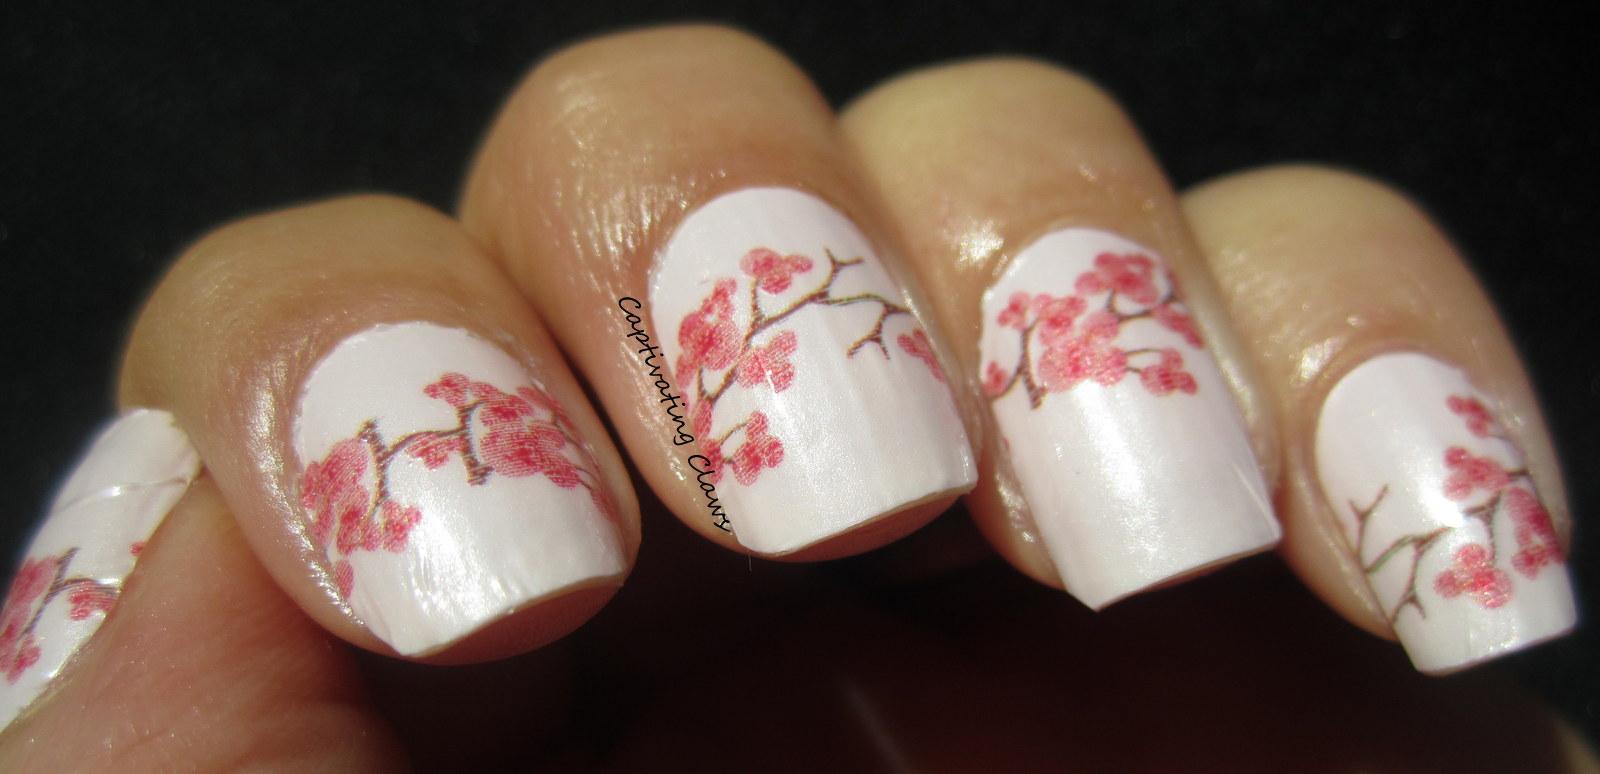 Captivating Claws: Incoco Real Nail Polish Appliques